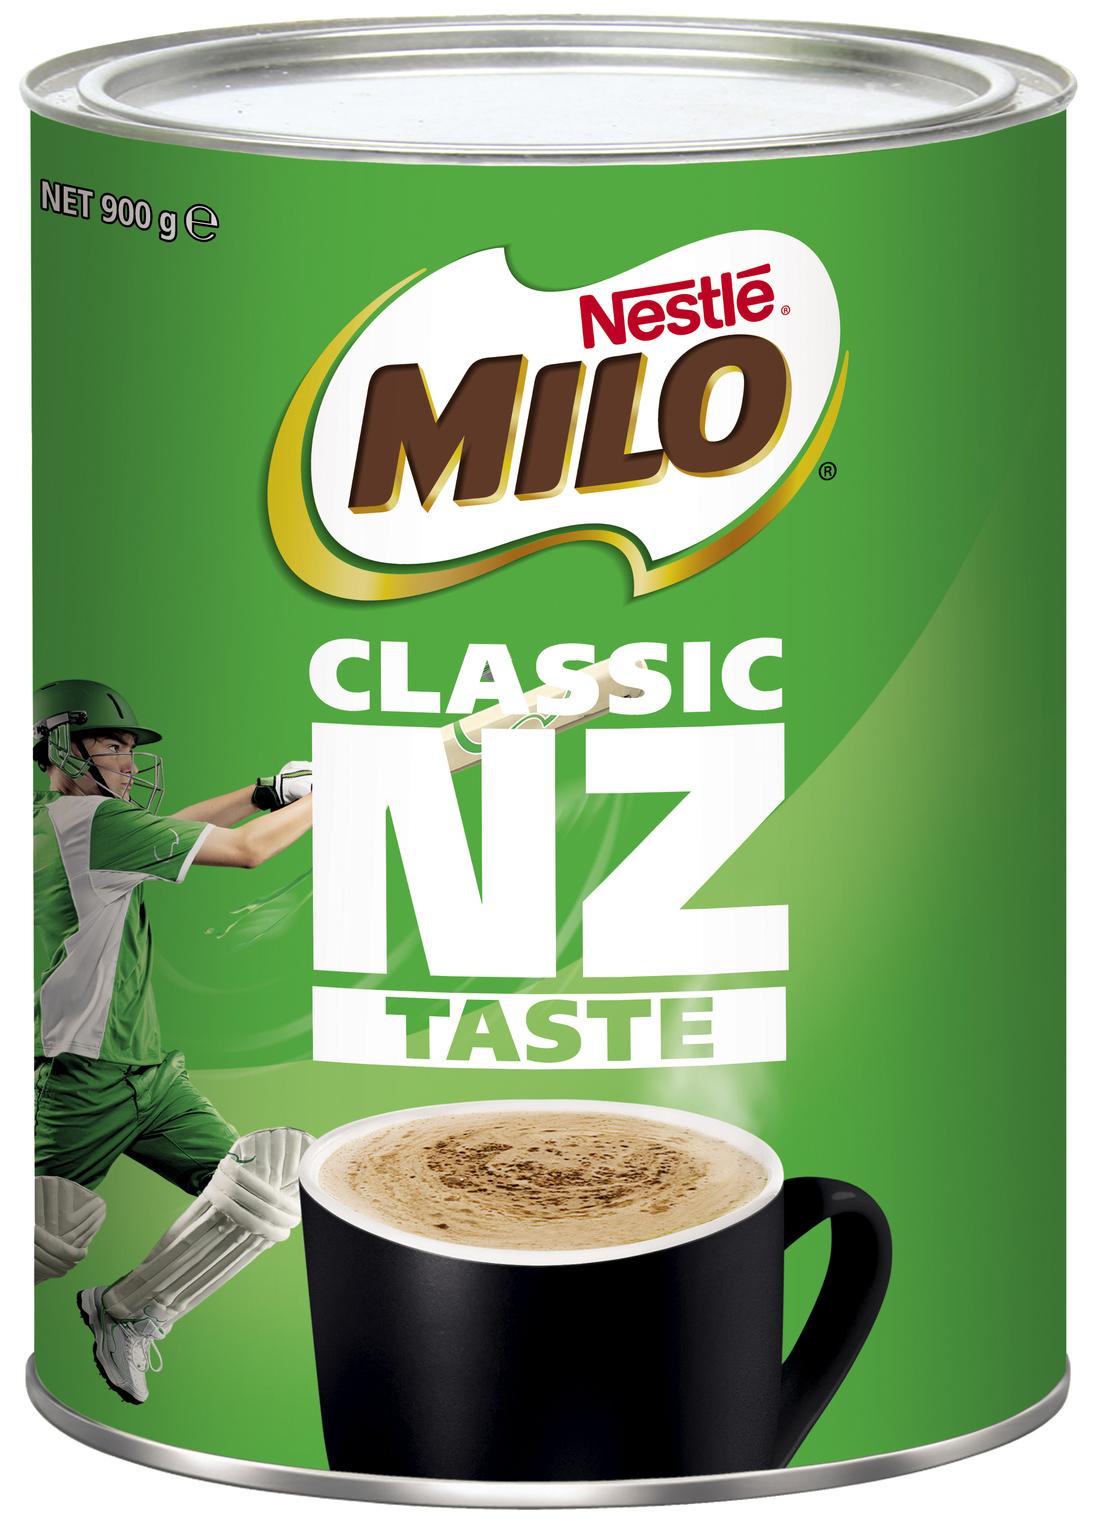 Nestle Milo 900g image